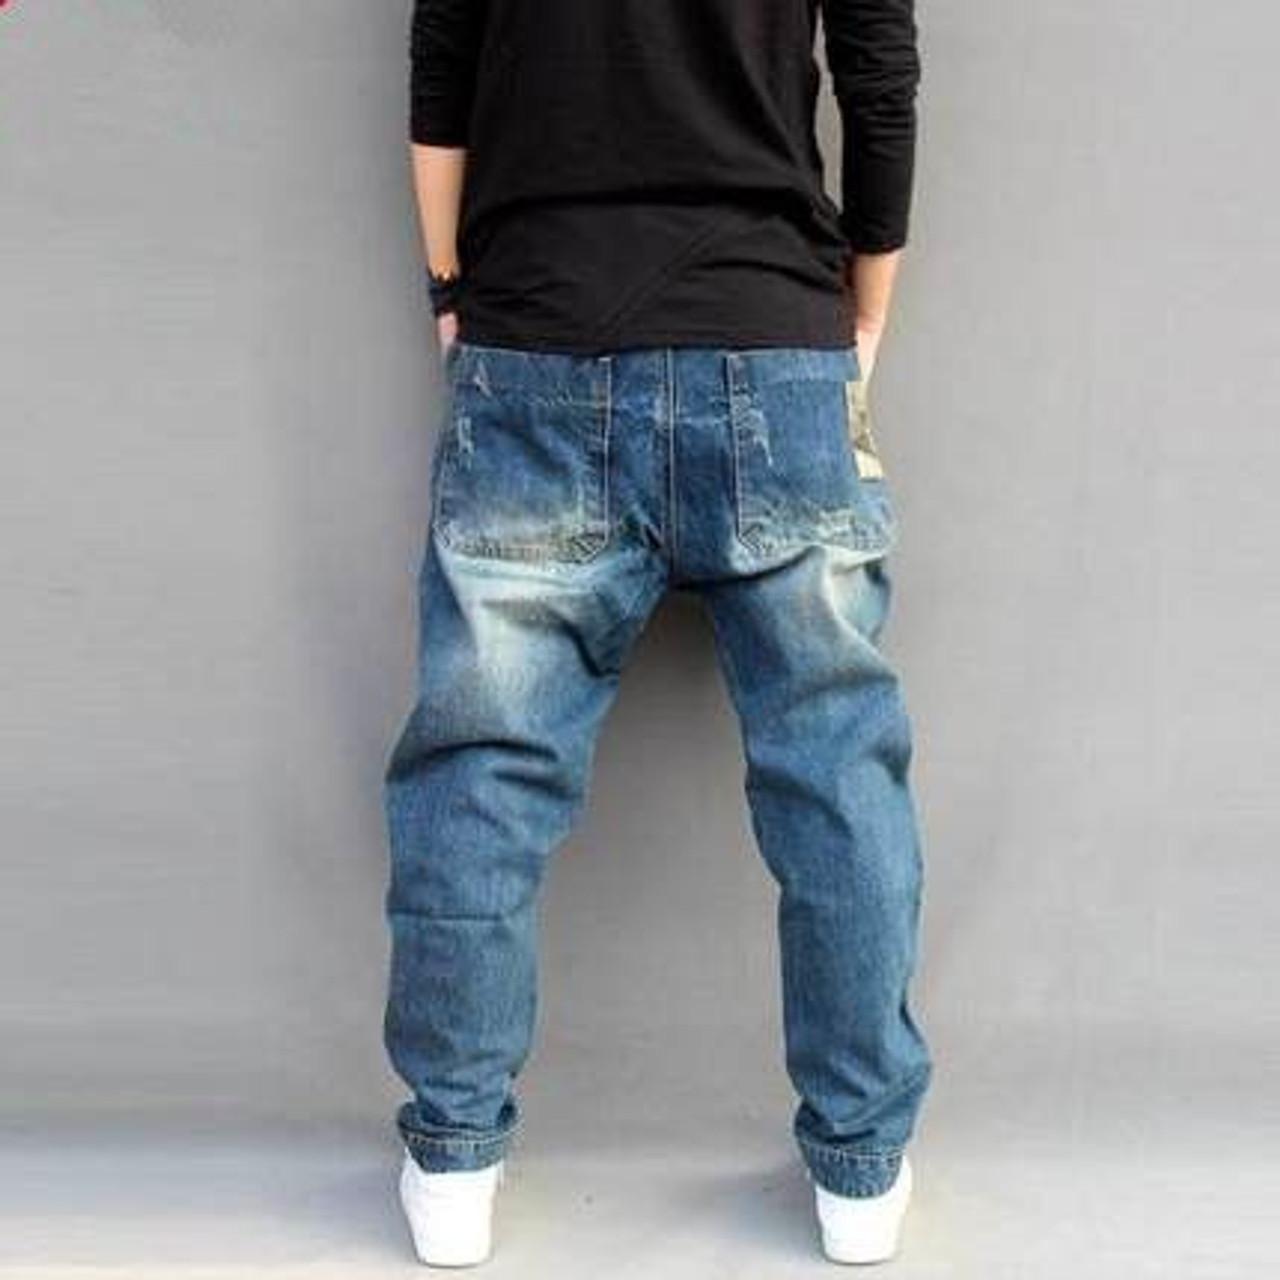 Blue Hole Ripped Baggy Jeans Mens Hip Hop Streetwear Skateboard Denim Pants Men S Camouflage Loose Jeans Plus Size 4xl 102106 Onshopdeals Com